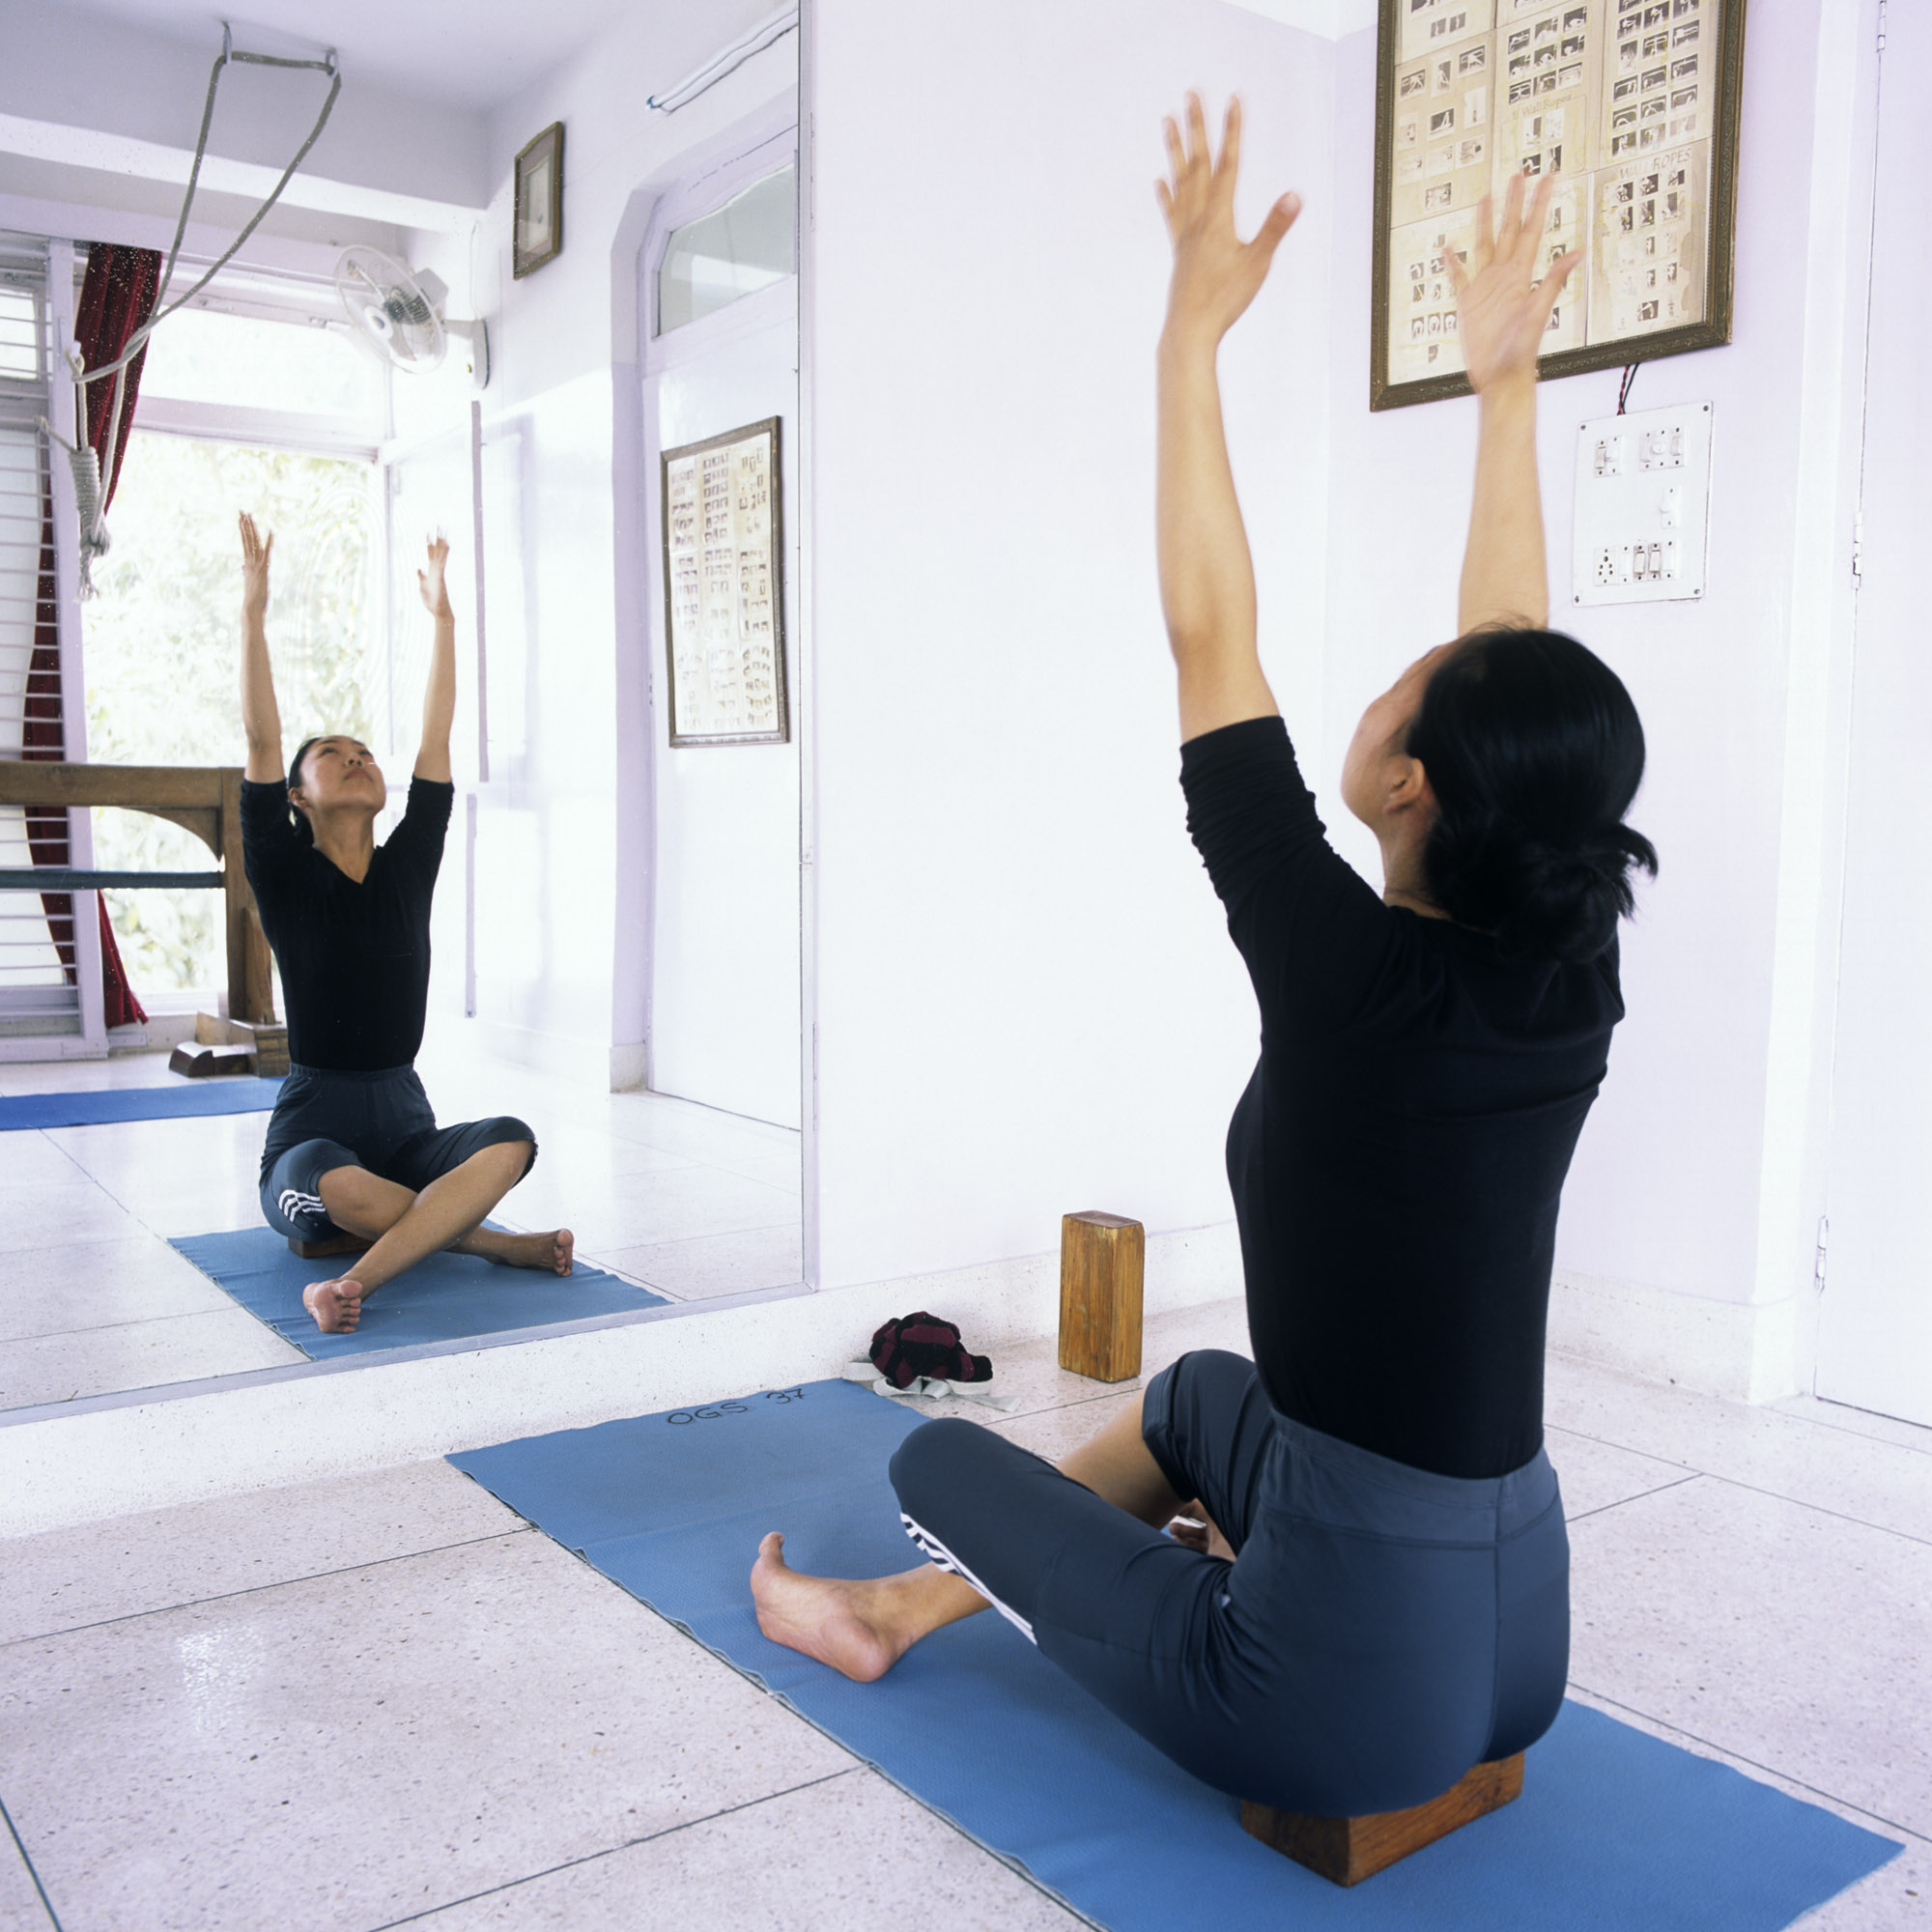 Book_Yoga in India_14